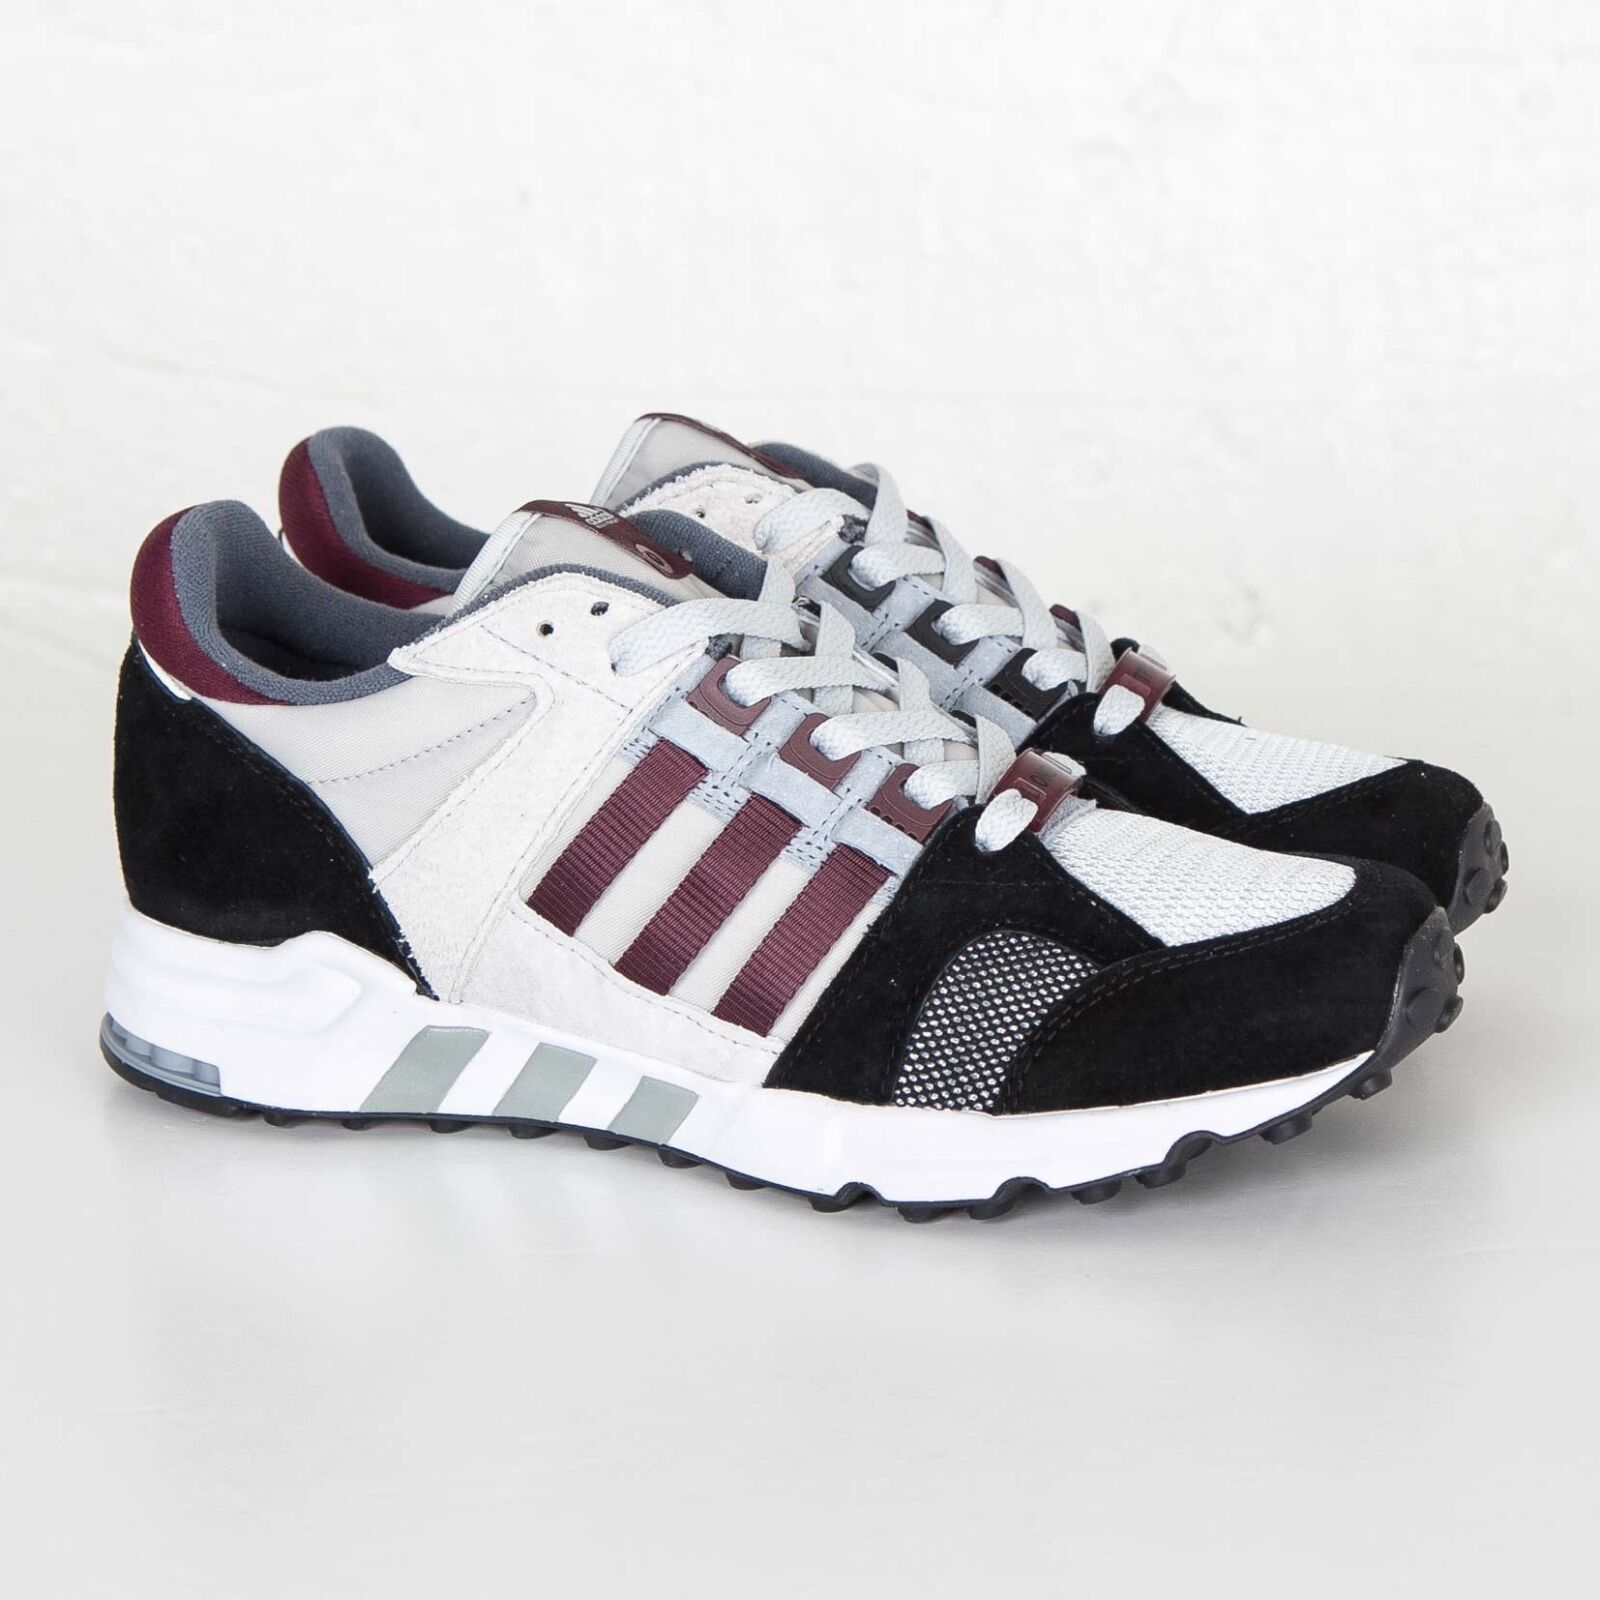 NIB Adidas Consortium x Footpatrol Equipment Running Cushion 93 Sneakers S80568